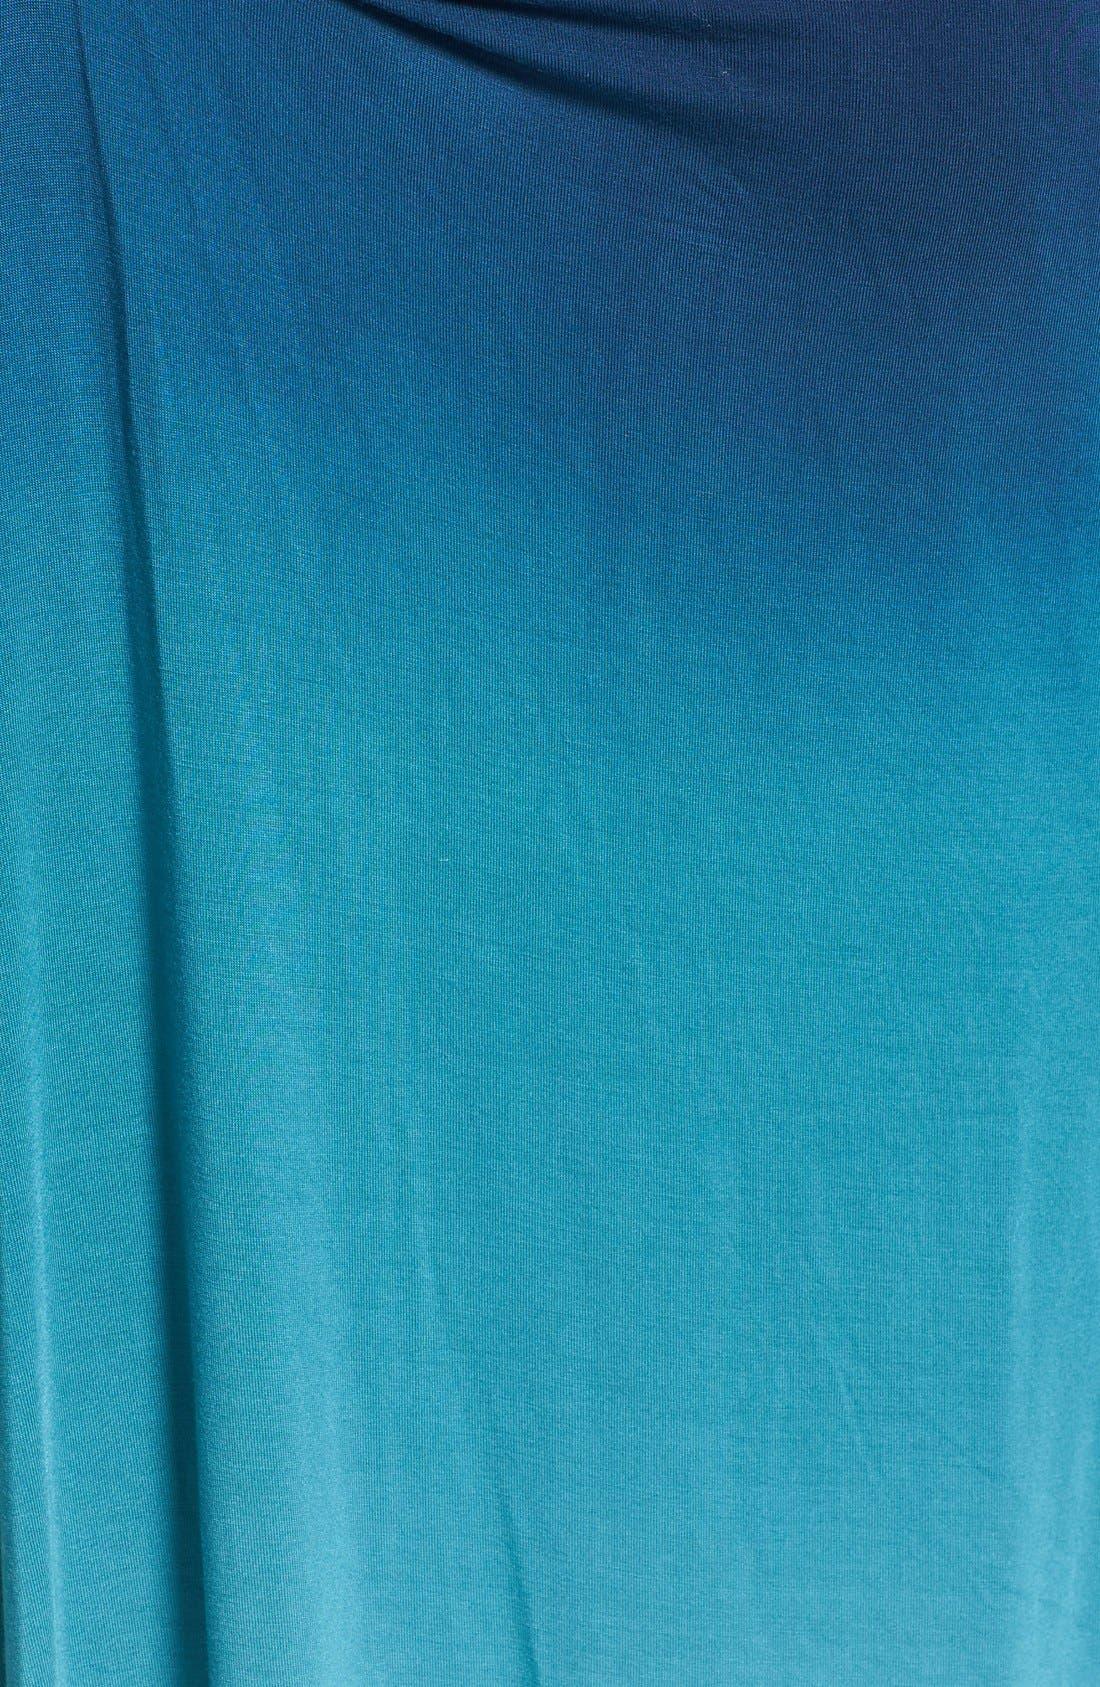 Alternate Image 3  - Young, Fabulous & Broke 'Hamptons' Racerback Jersey Maxi Dress